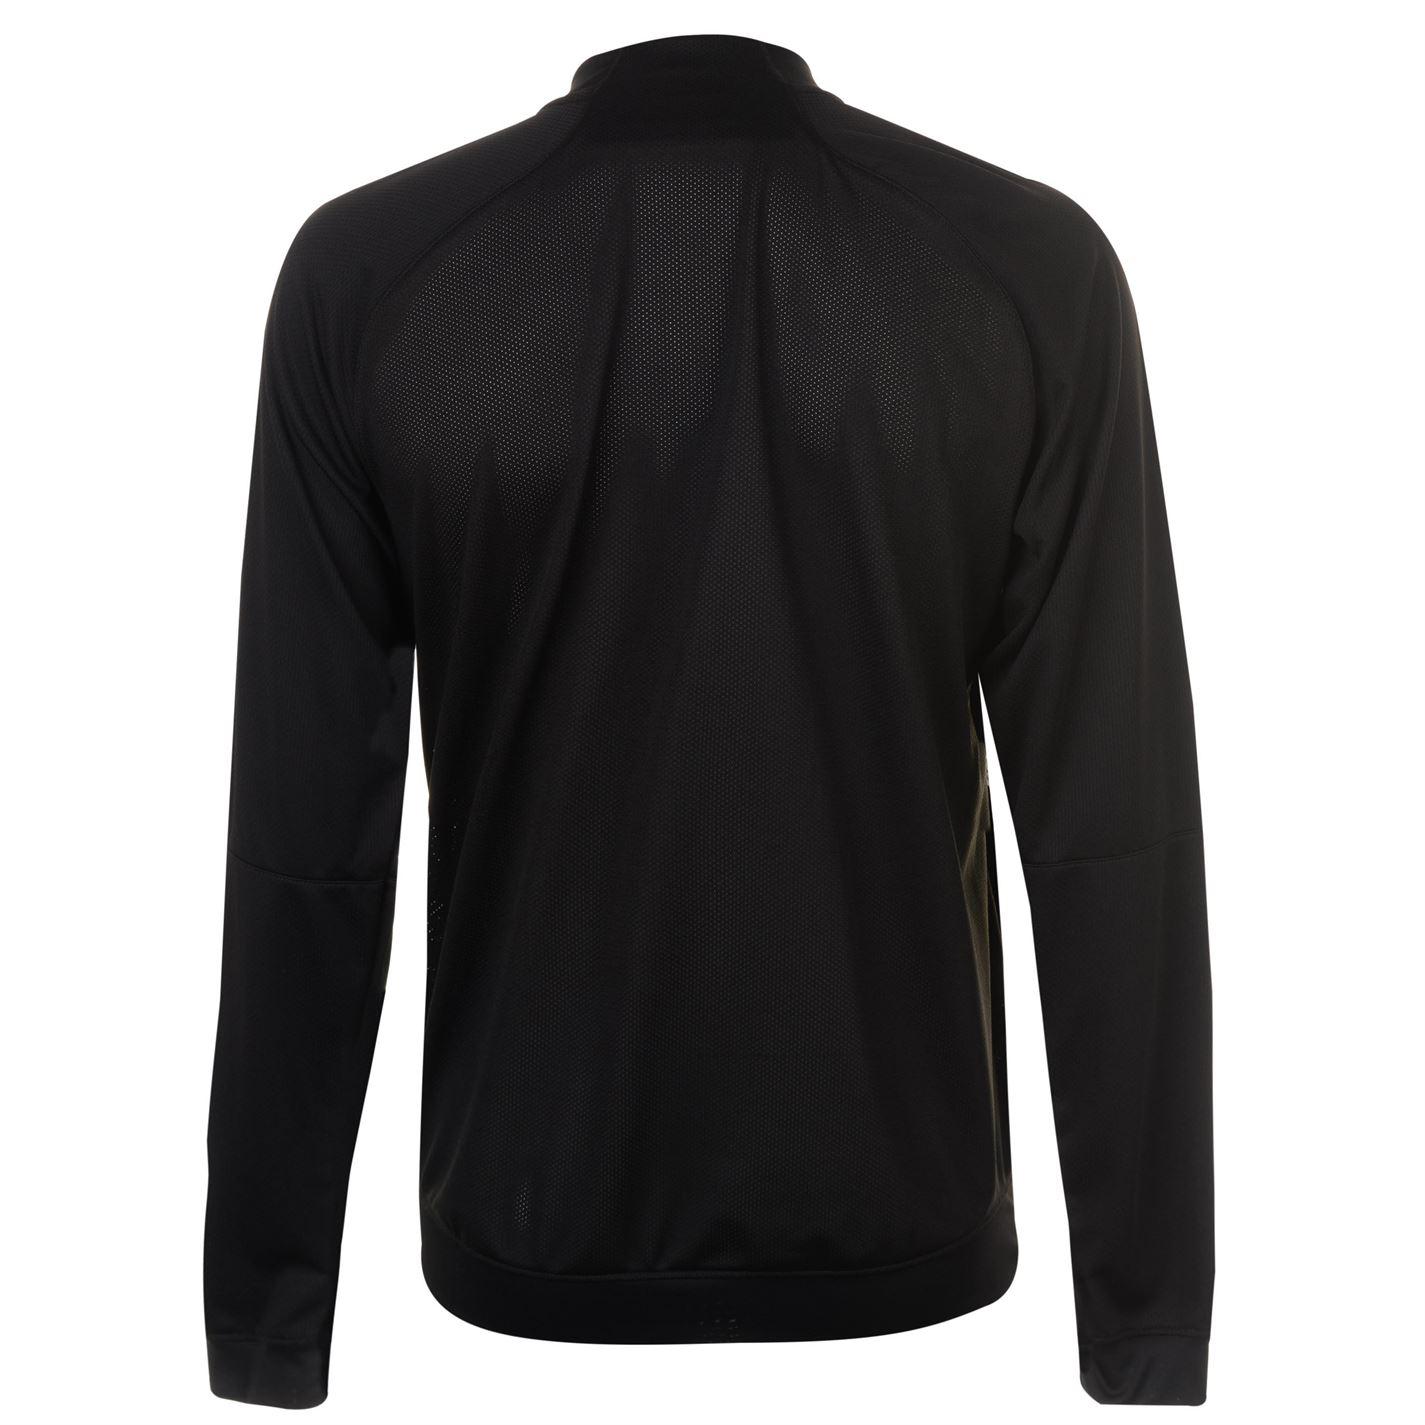 Puma Felpa Girocollo NXT Uomo Gents Performance Pullover T Shirt Tee Top